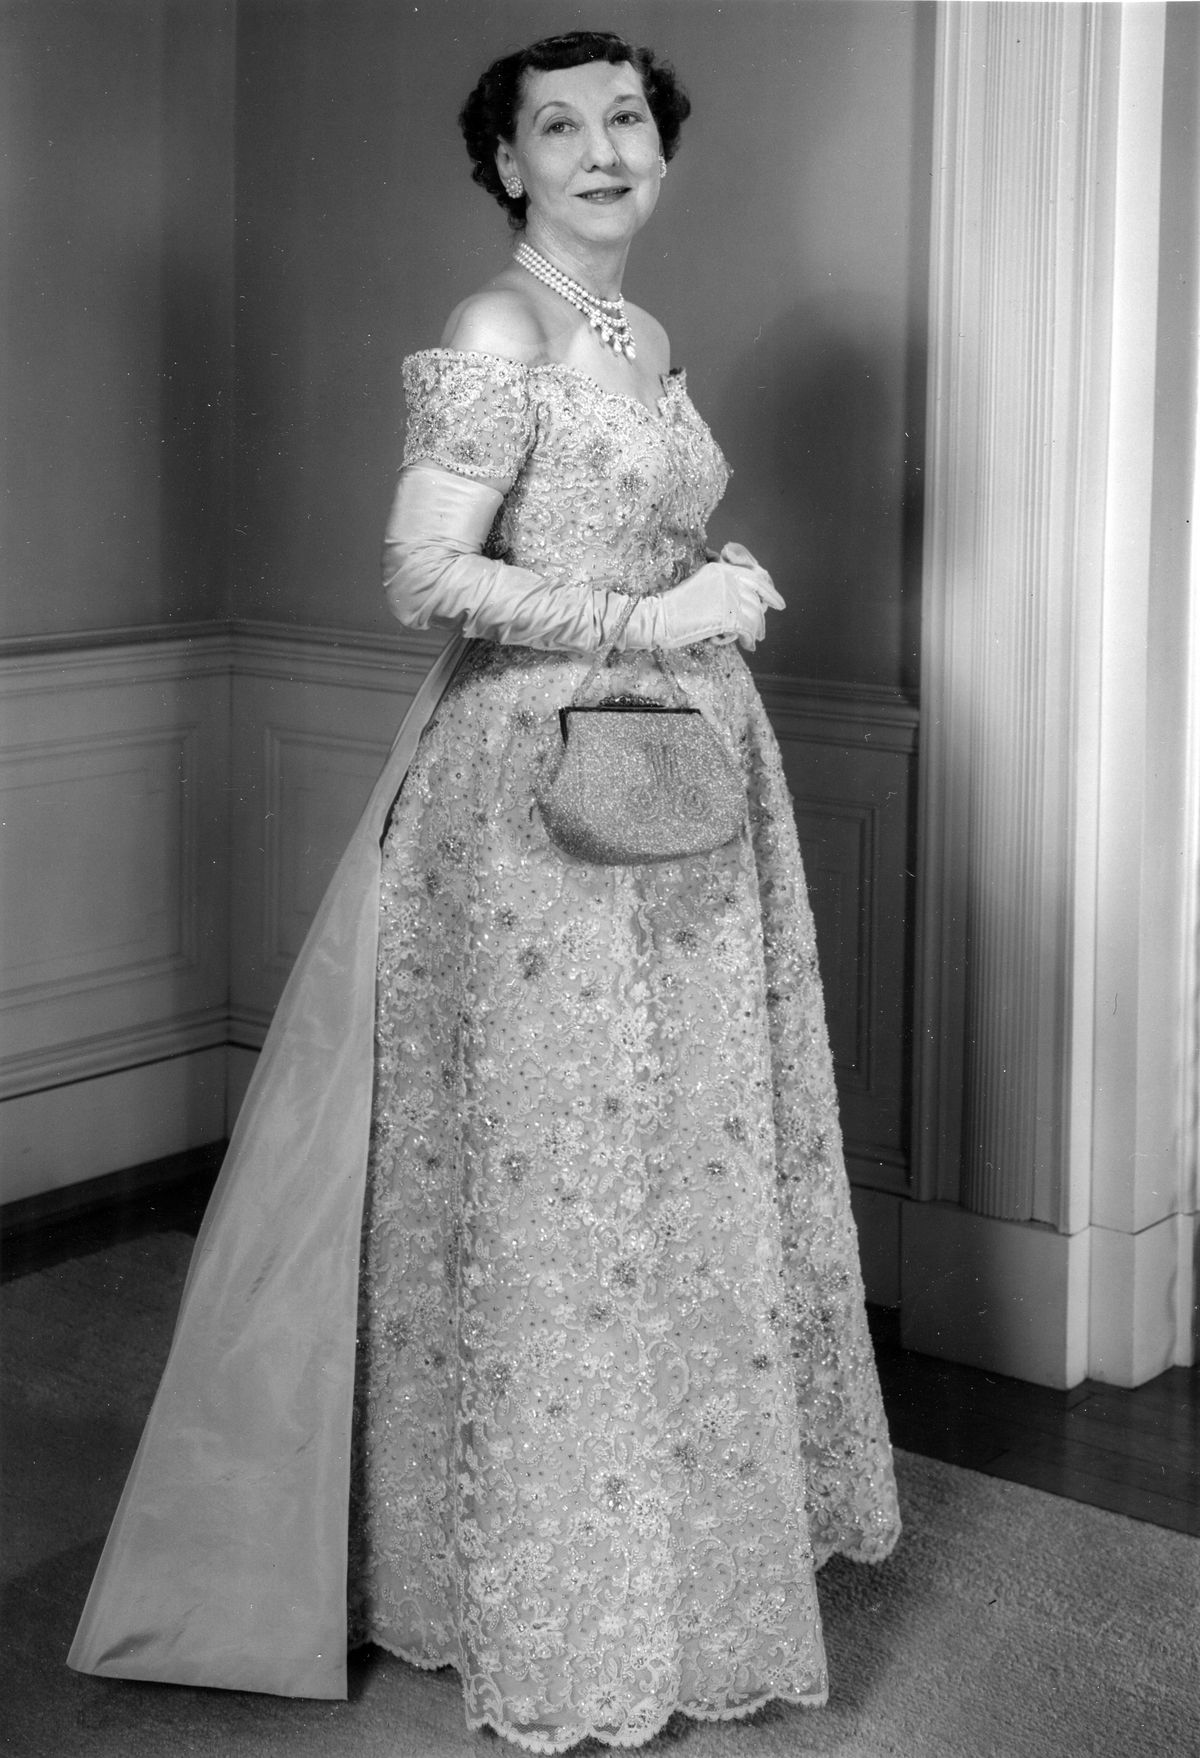 Mamie Eisenhower's inaugural ballgown